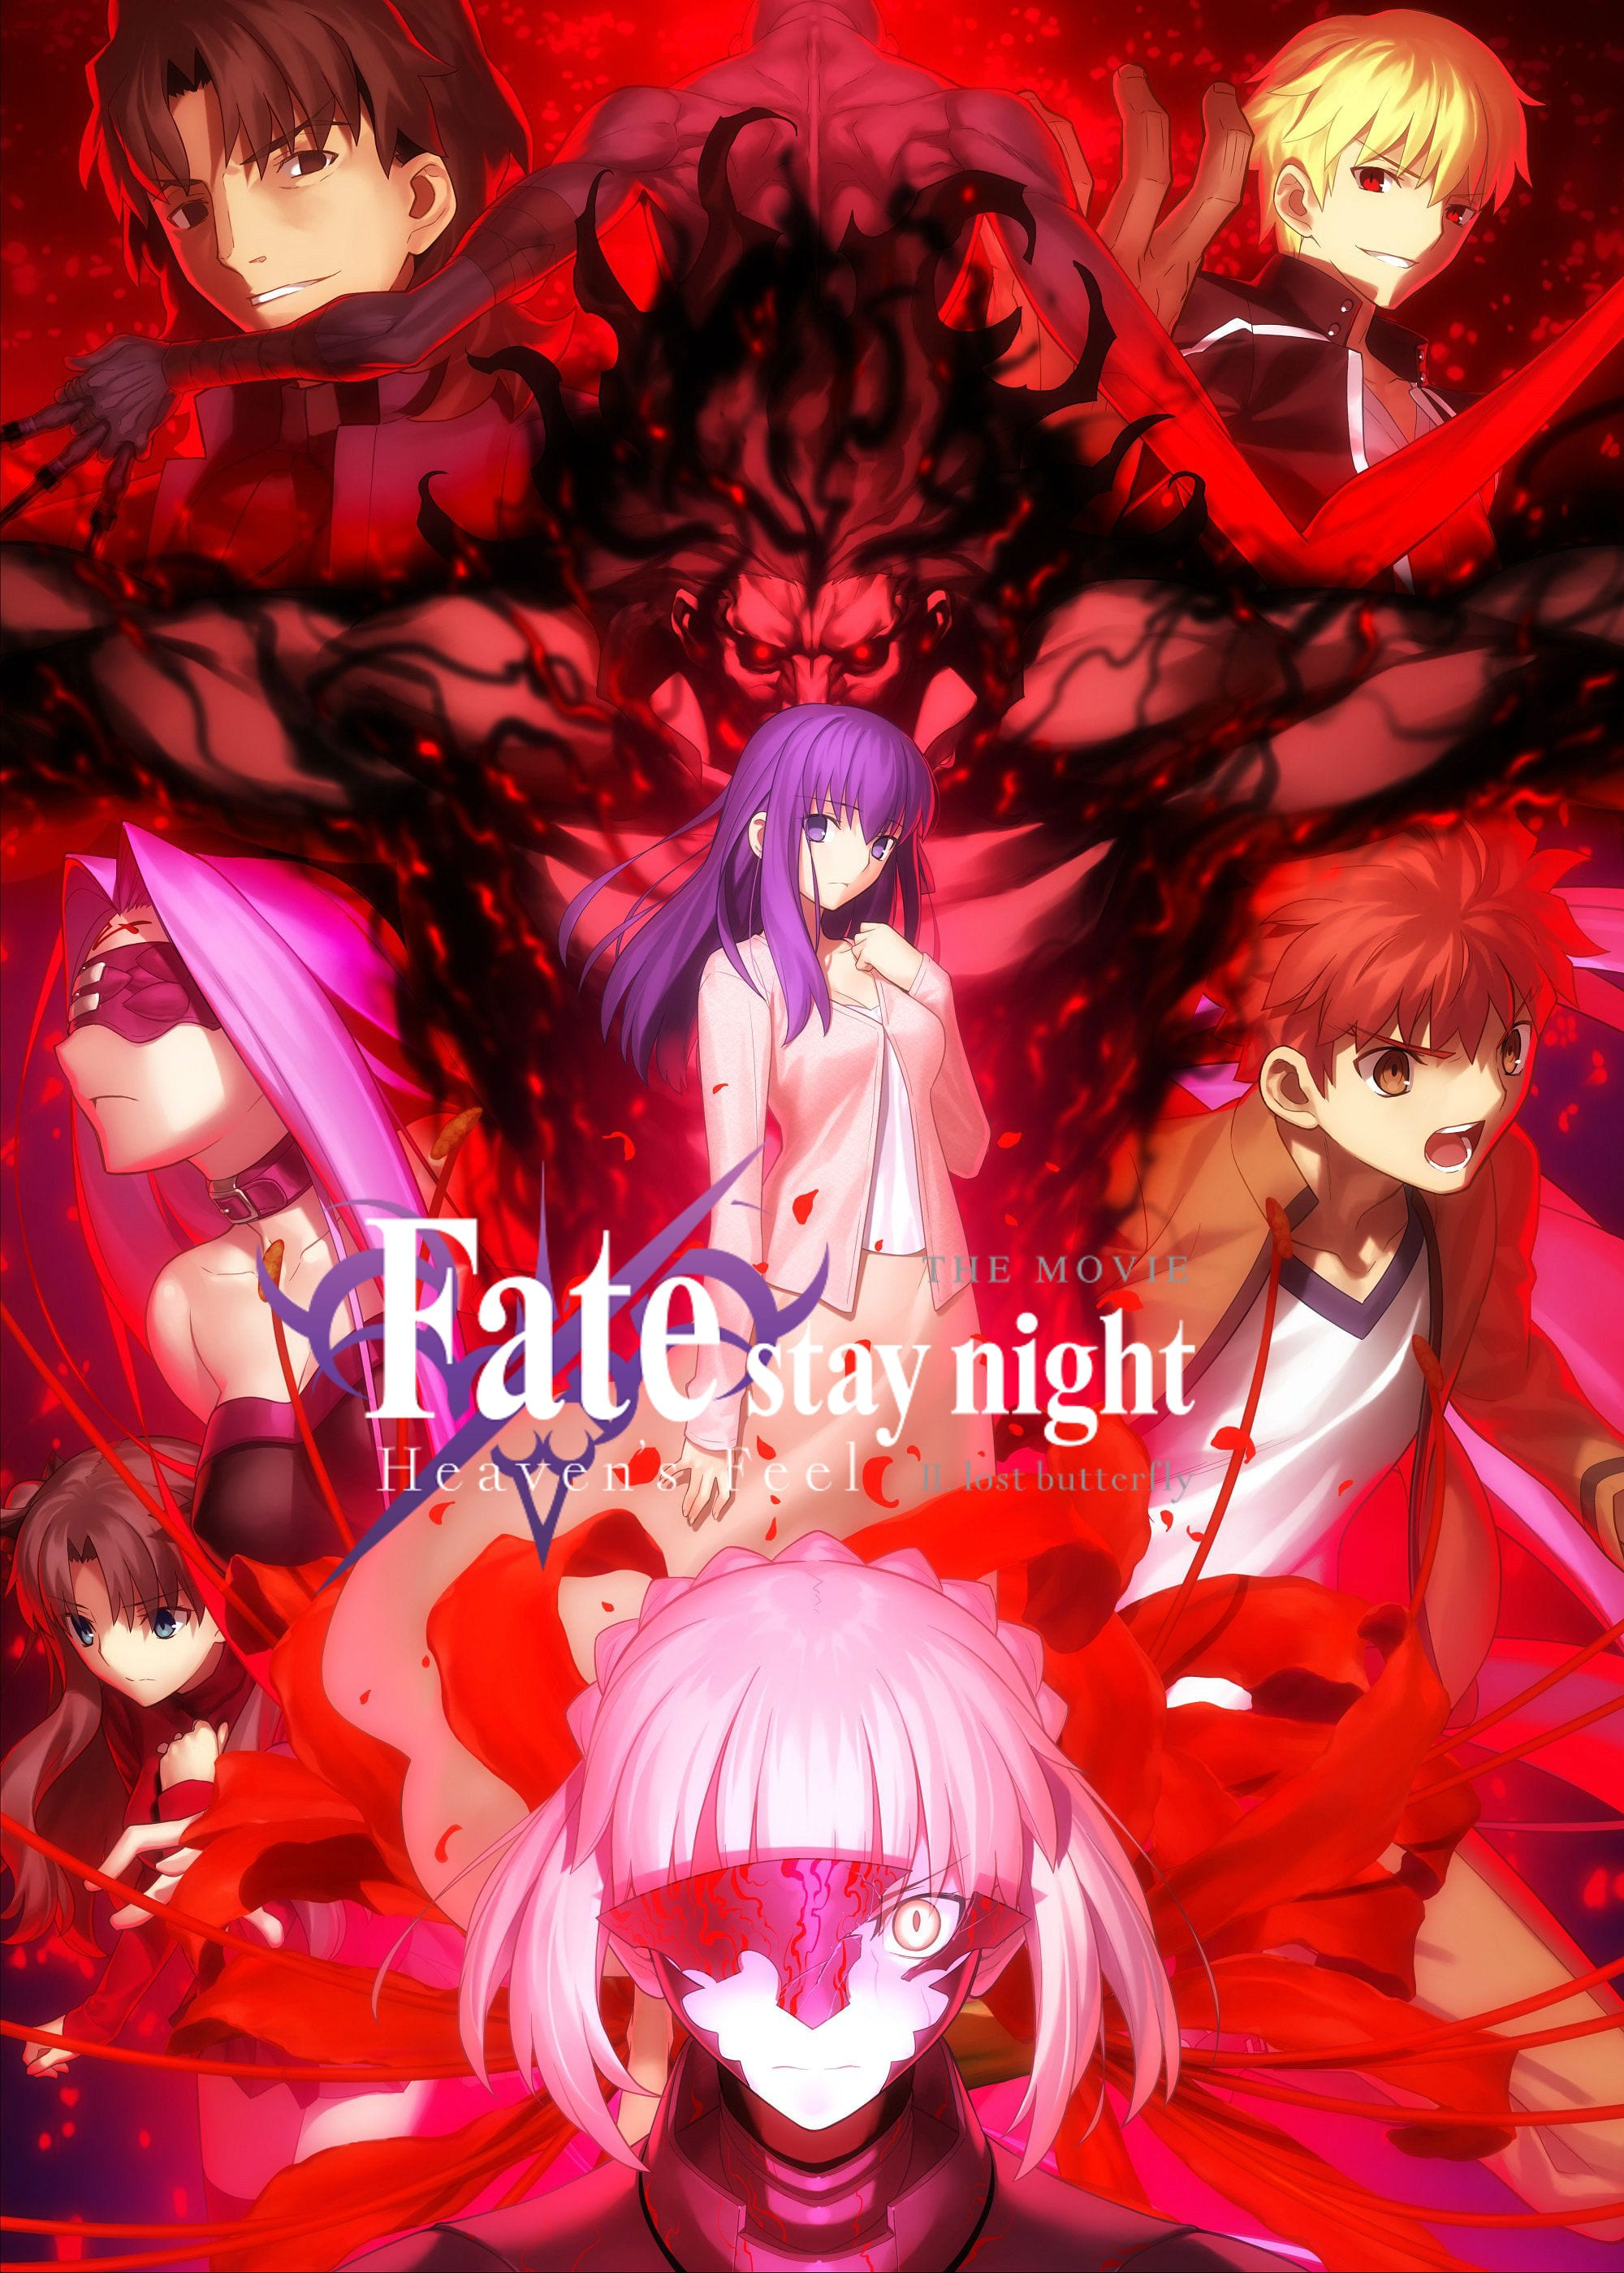 https://mirai.ai/wp-content/uploads/FateStay-Night-Heavens-Feel-II-v2.jpg